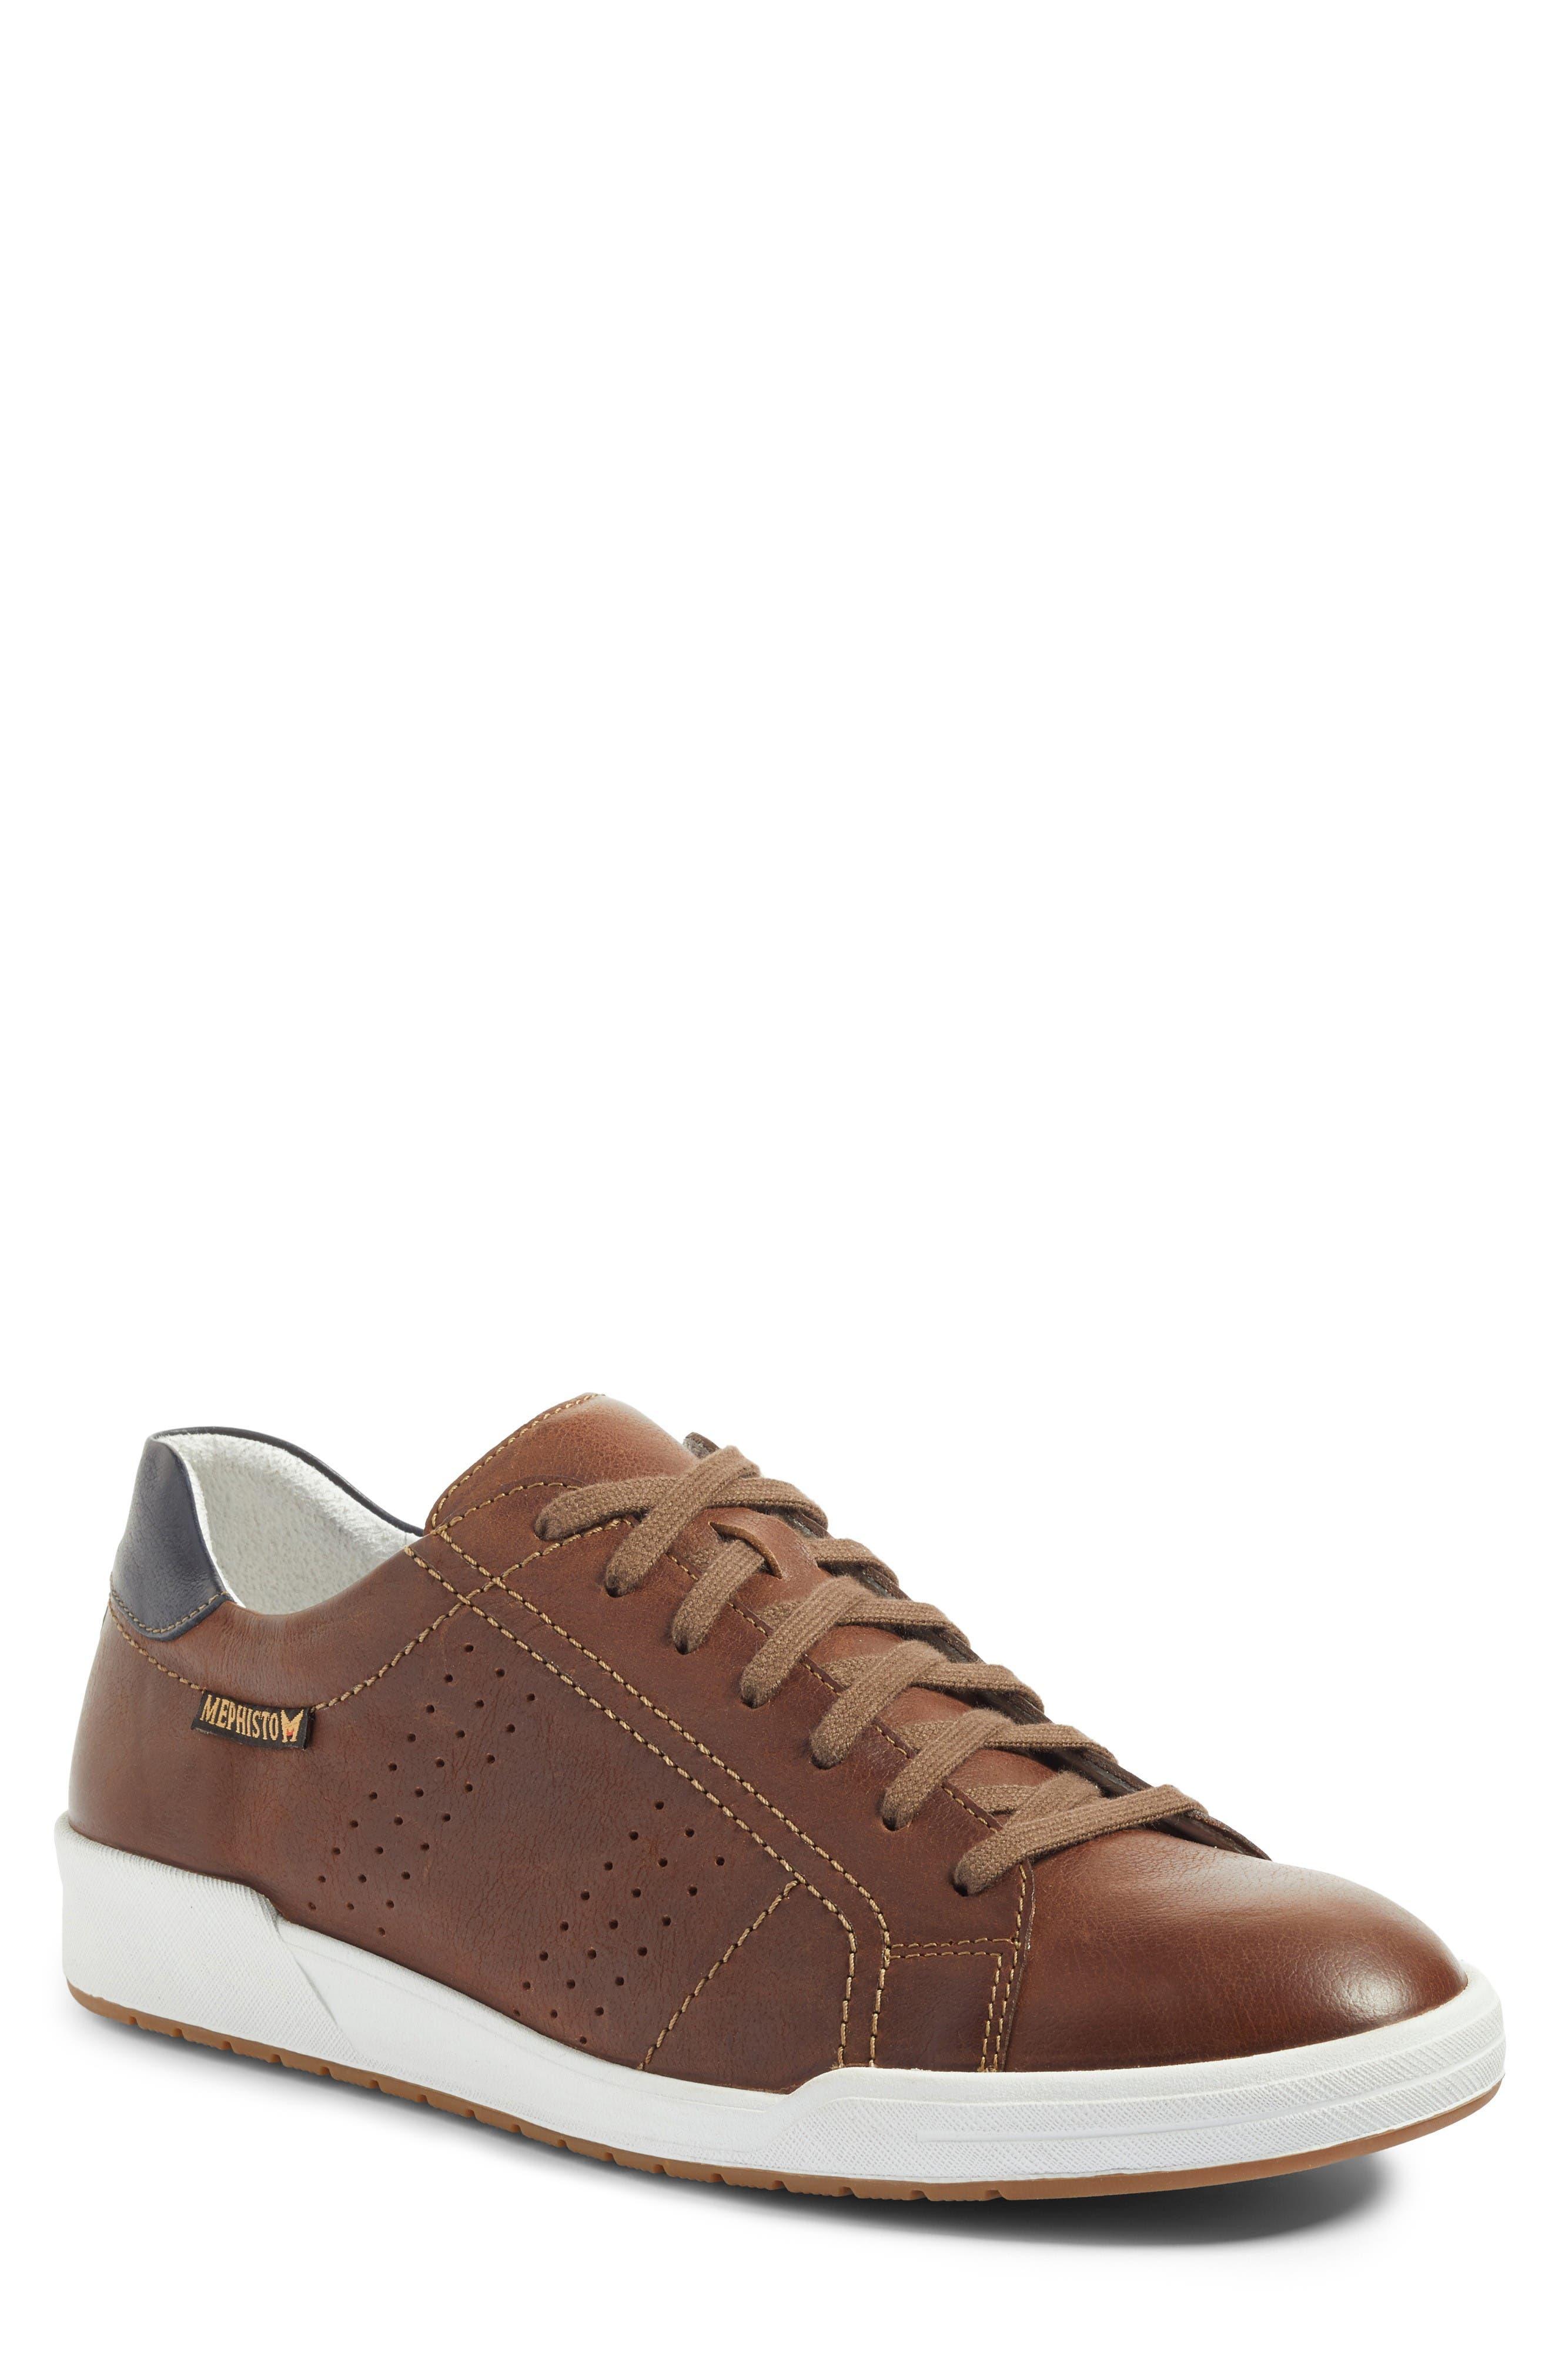 Mephisto Rufo Sneaker (Men)